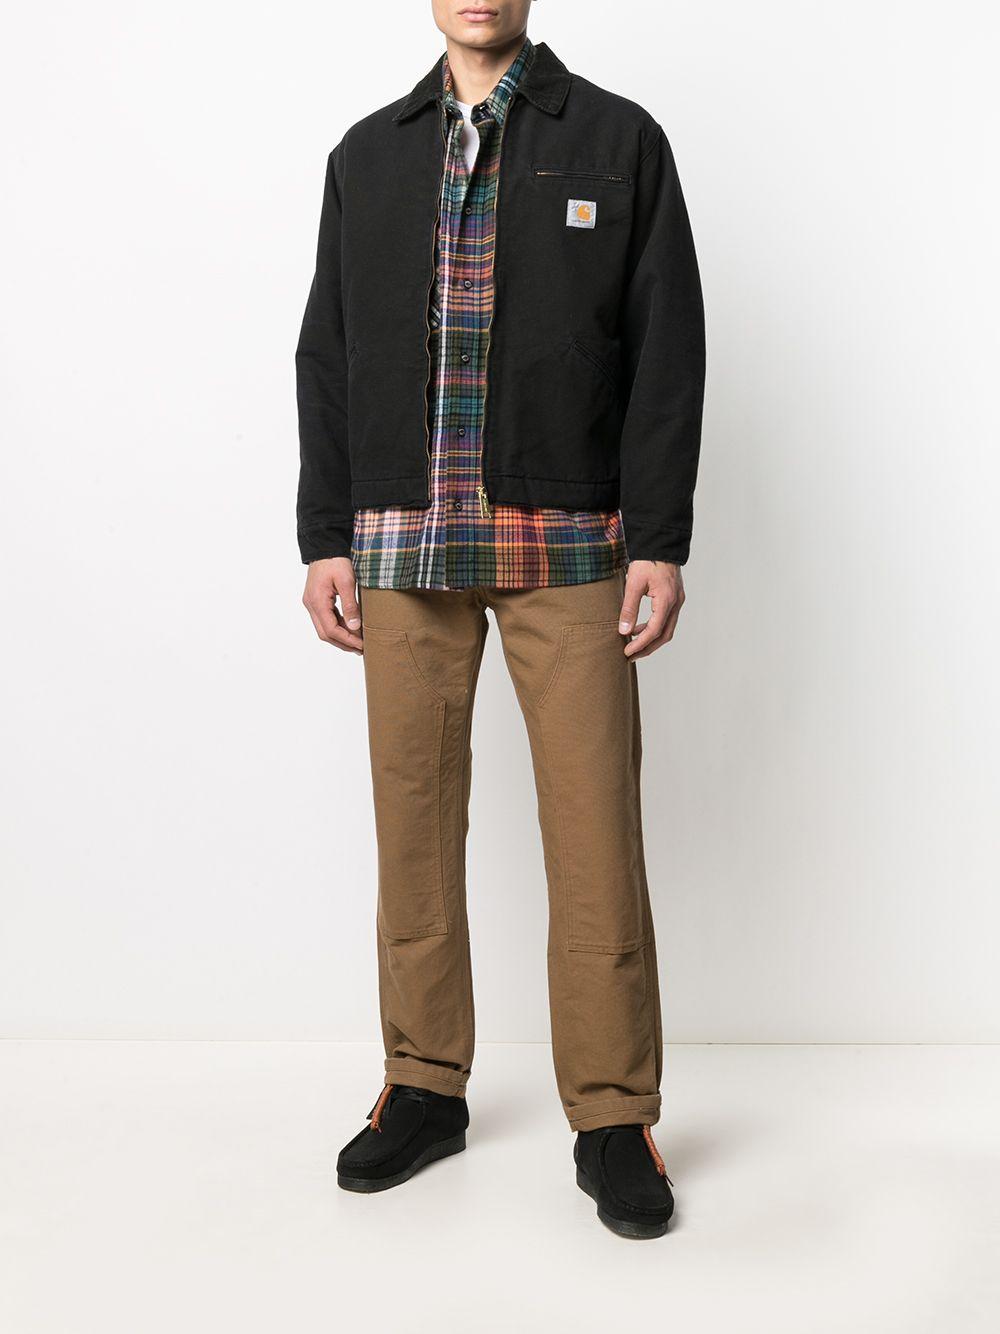 giacca detroit og uomo nera in cotone CARHARTT WIP | Giacche | I02735800E.3K